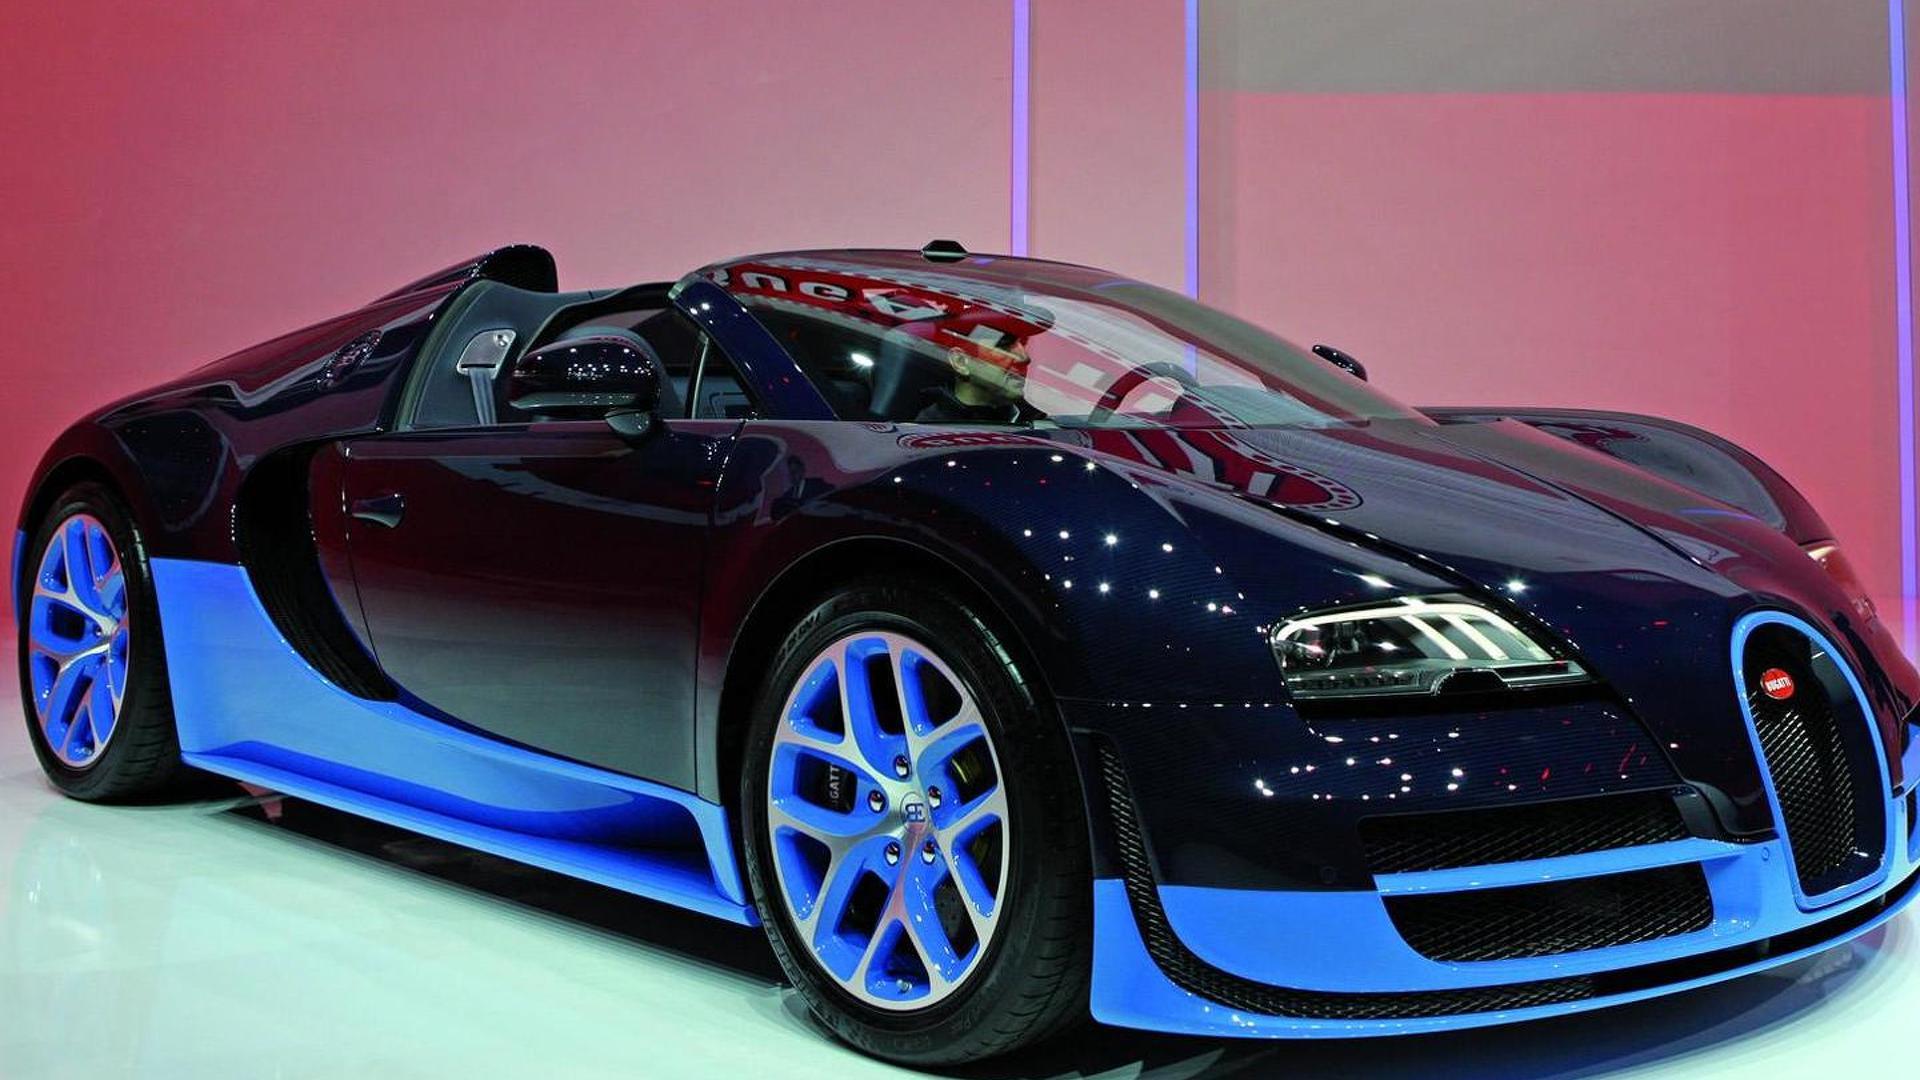 bugatti veyron grand sport vitesse takes a bow. Black Bedroom Furniture Sets. Home Design Ideas